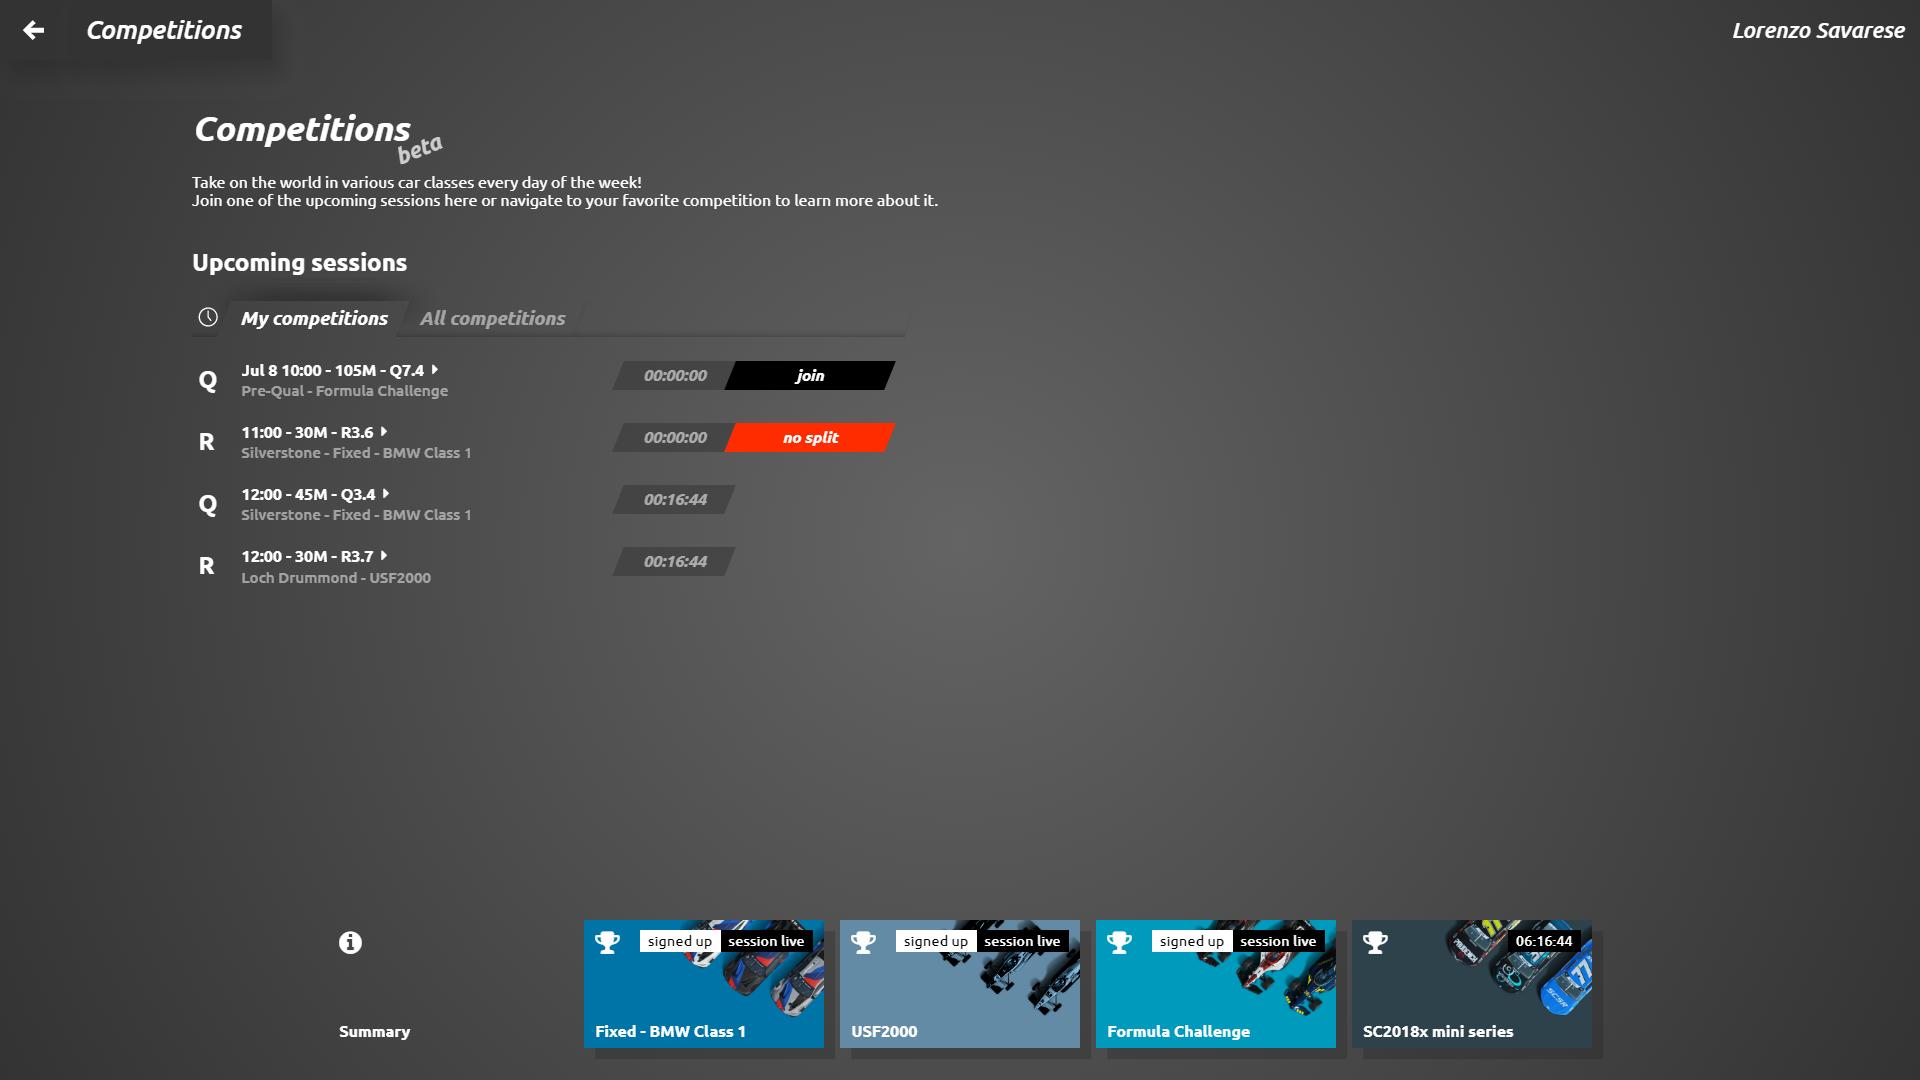 Screenshot 10_07_2021 11_43_15.png